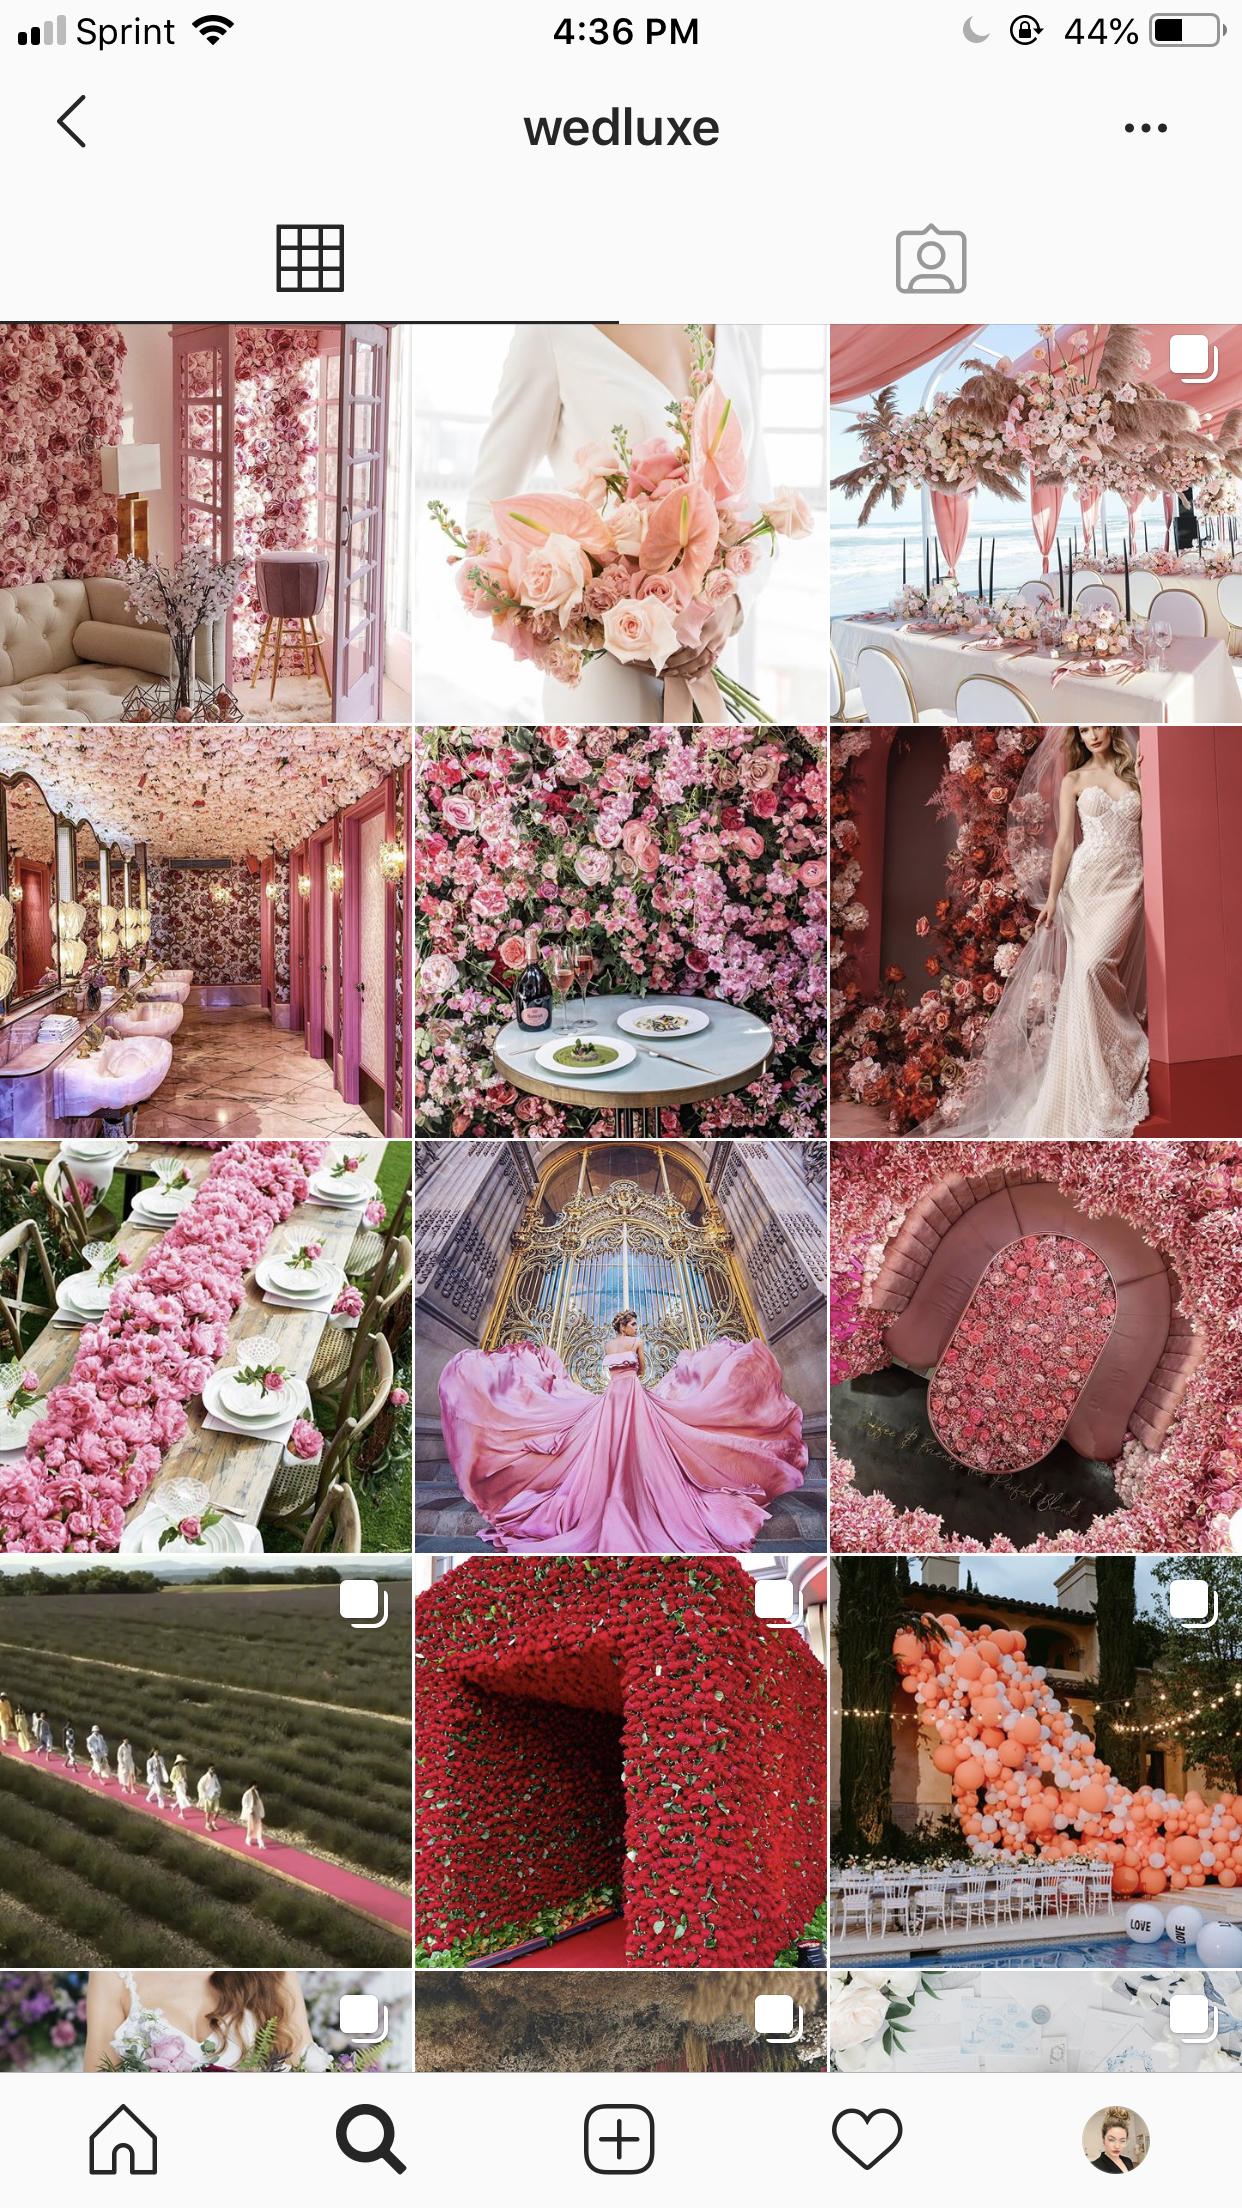 wedluxe bridal blog publication